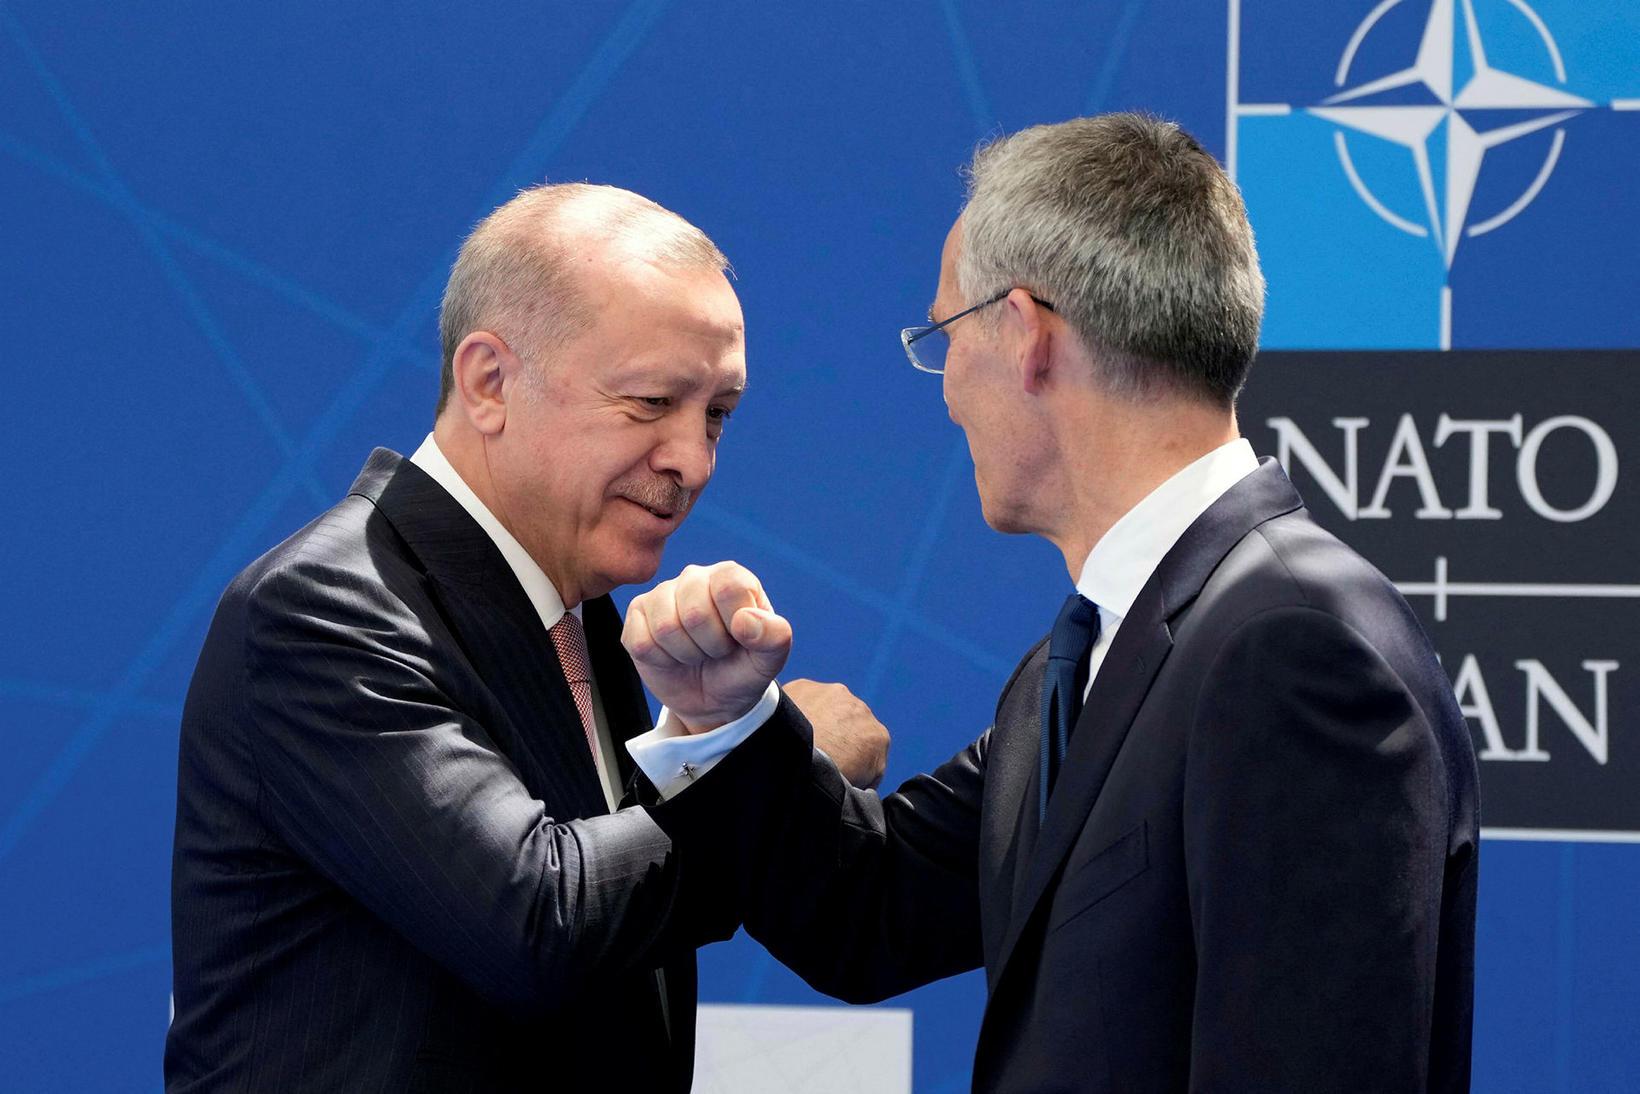 Recep Tayyip Erdogan, forseti Tyrklands og Jens Stoltenberg.